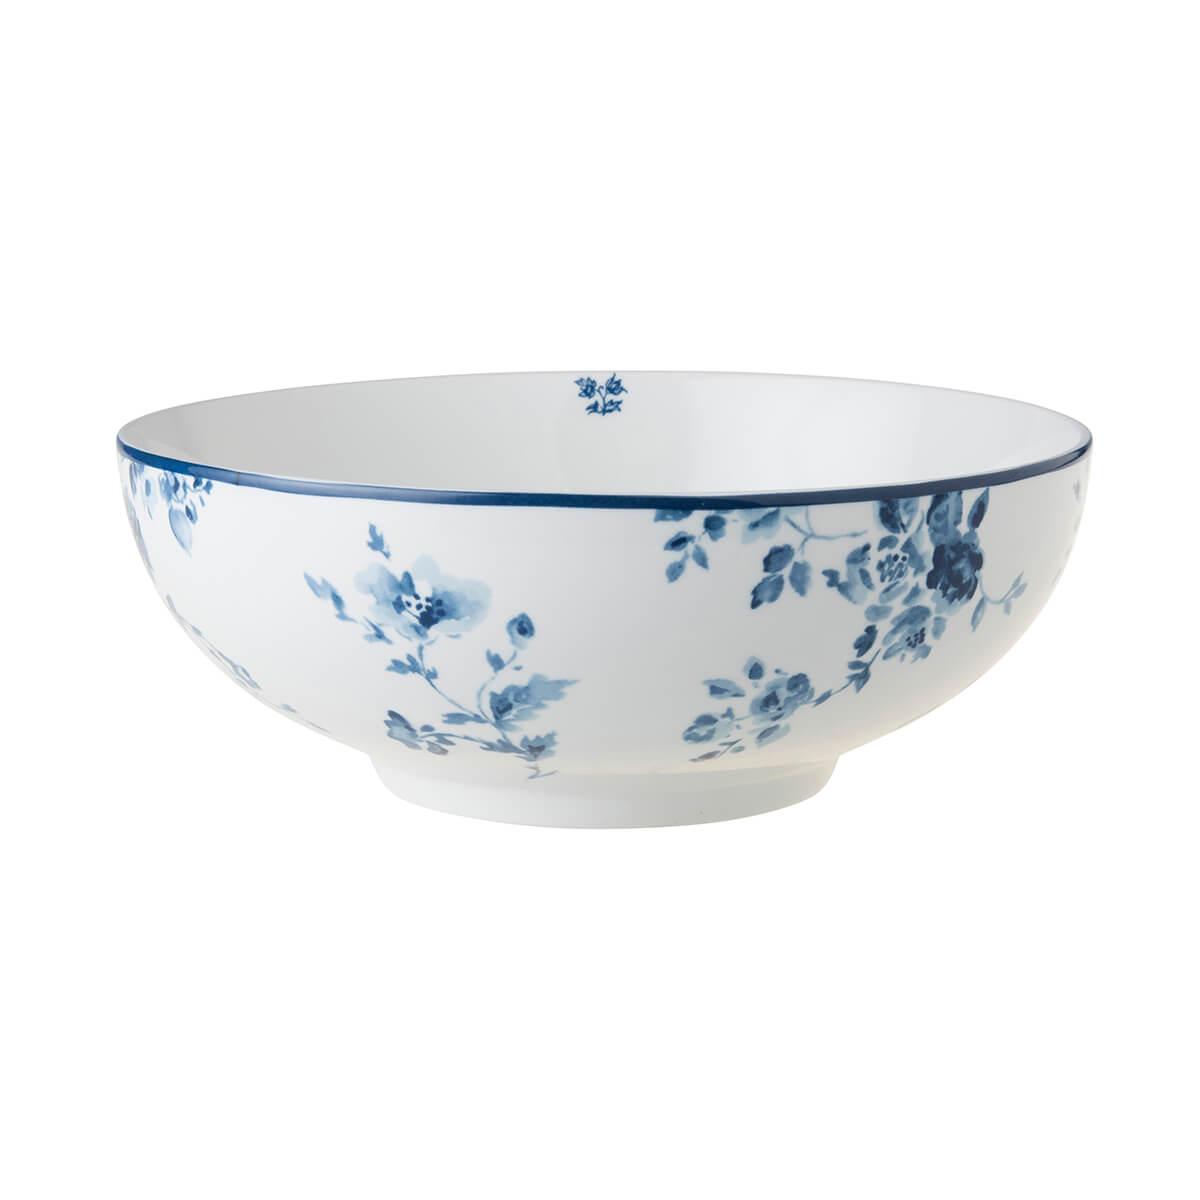 Онлайн каталог PROMENU: Салатник фарфоровый Laura Ashley BLUEPRINT, 23 см, белый с синими розами Laura Ashley 178680